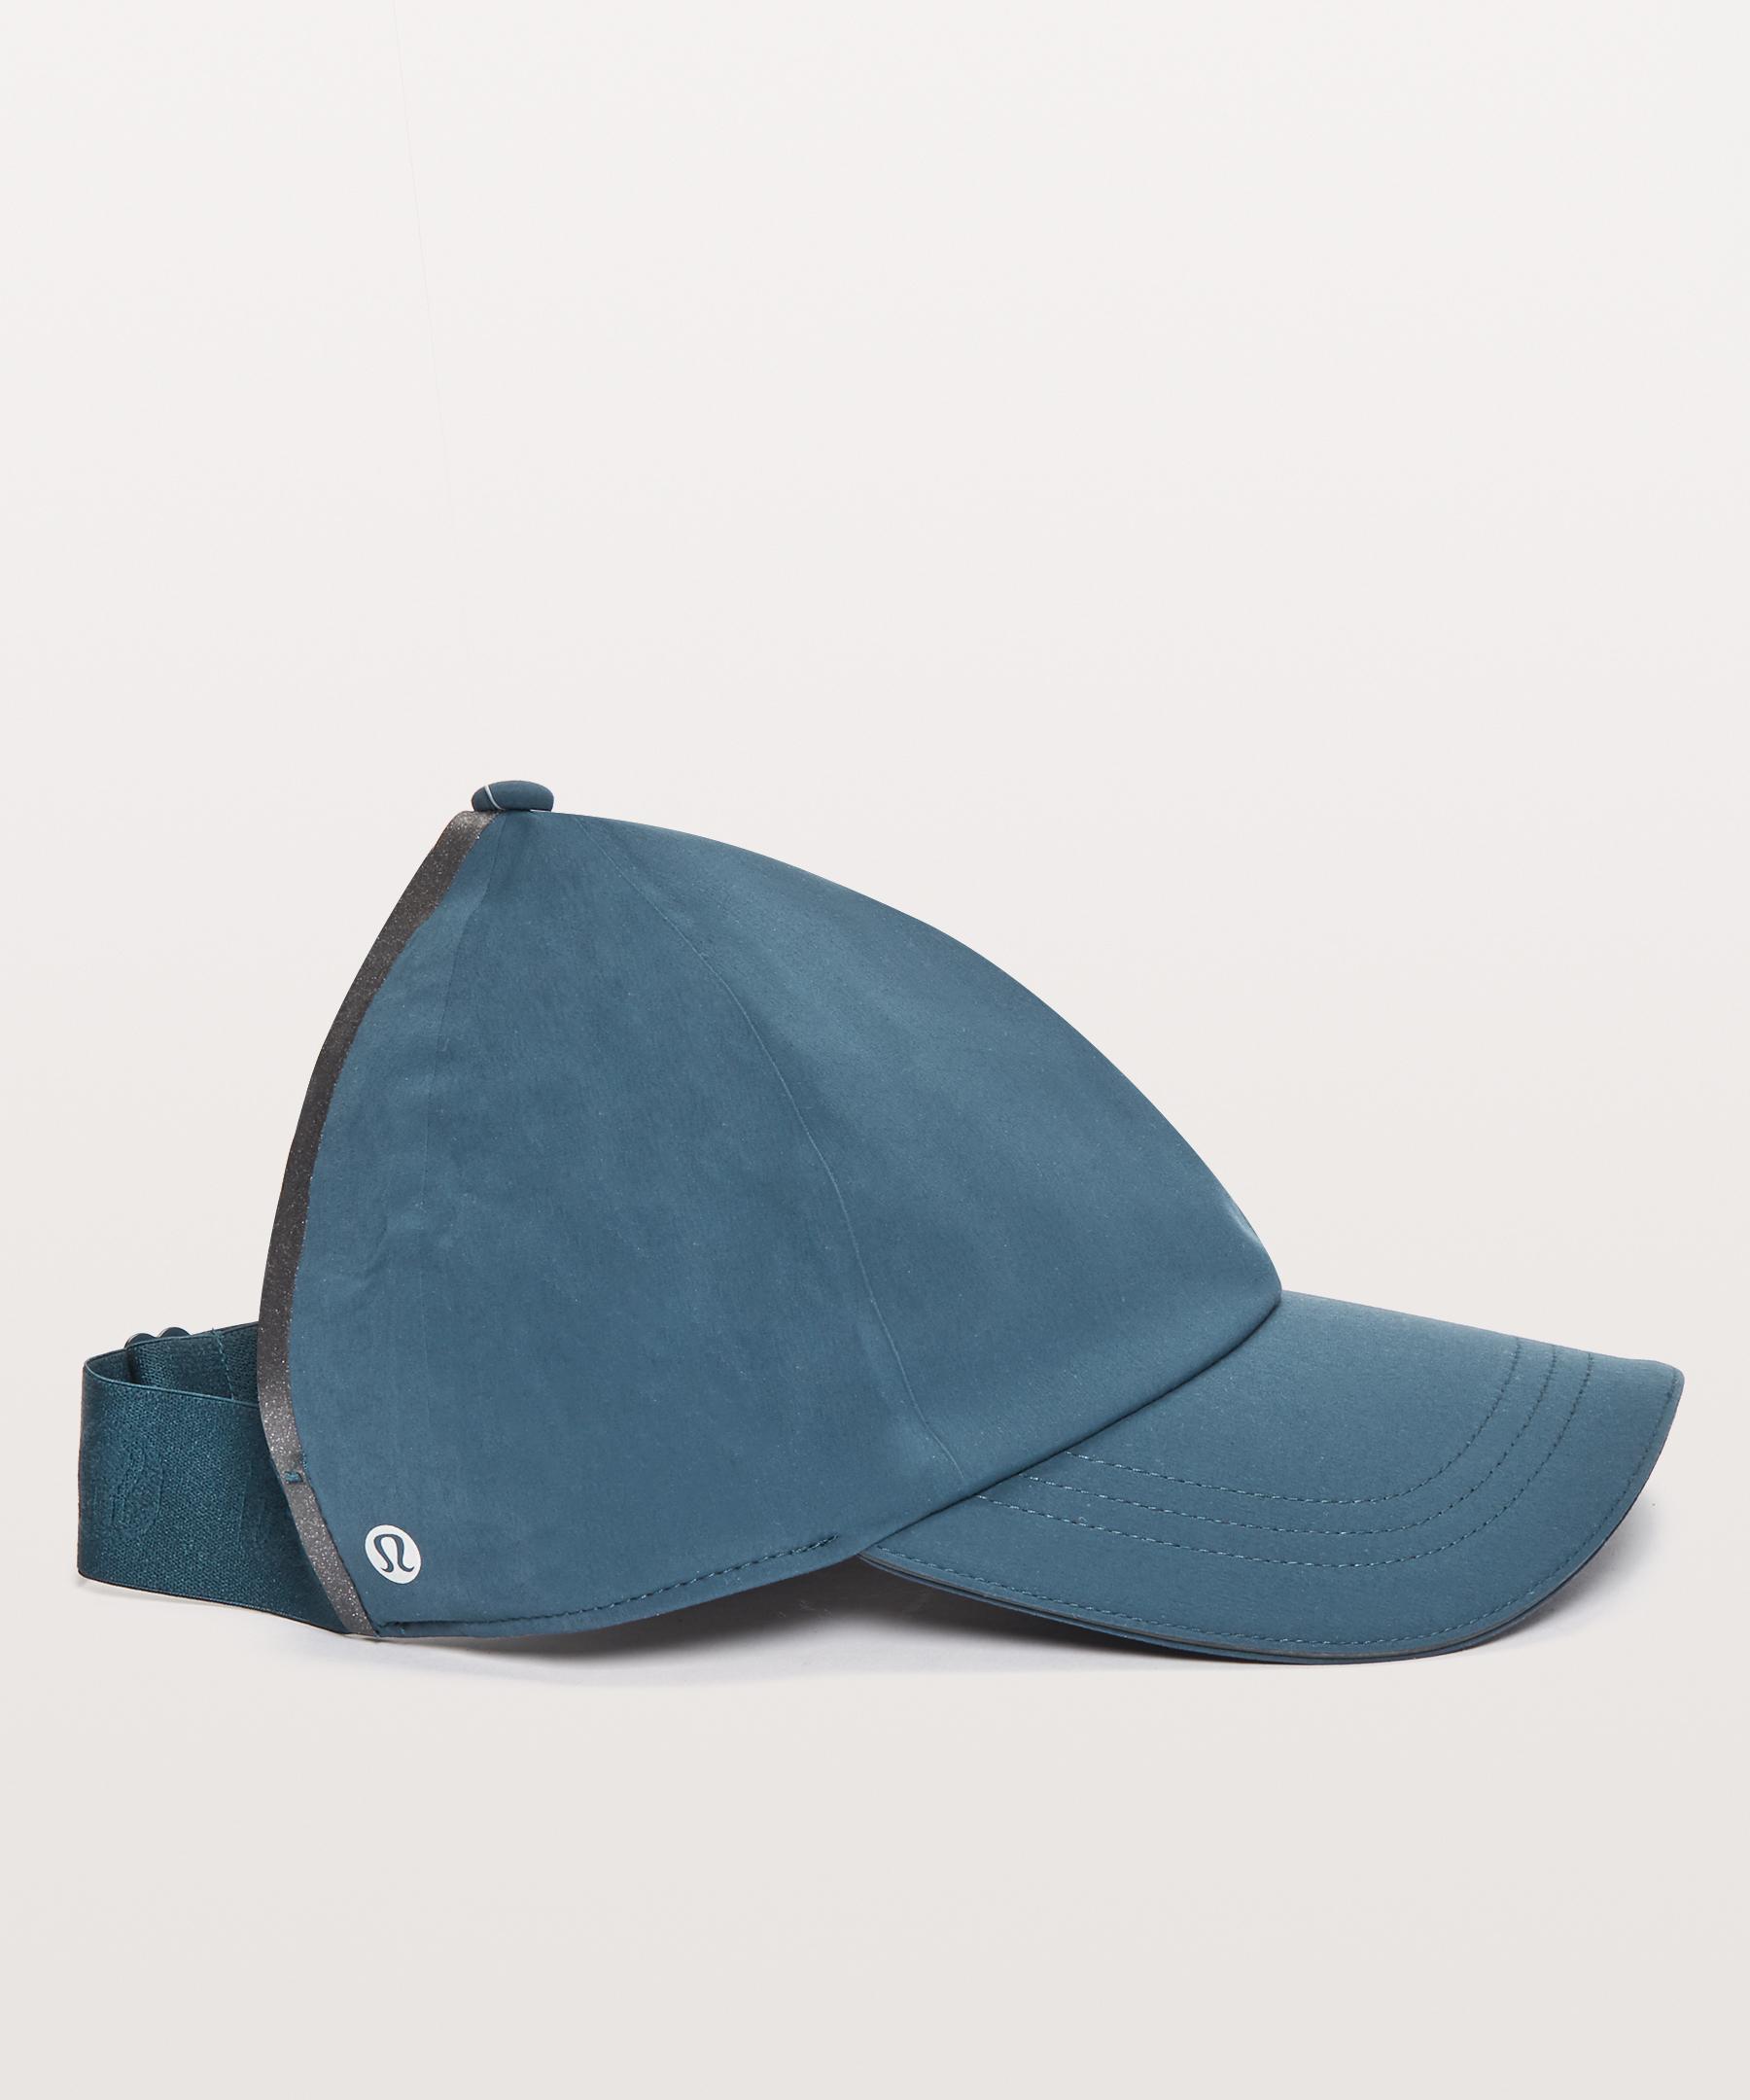 Lyst - lululemon athletica Baller Hat Run  ponytail in Blue 319a2b37e7b